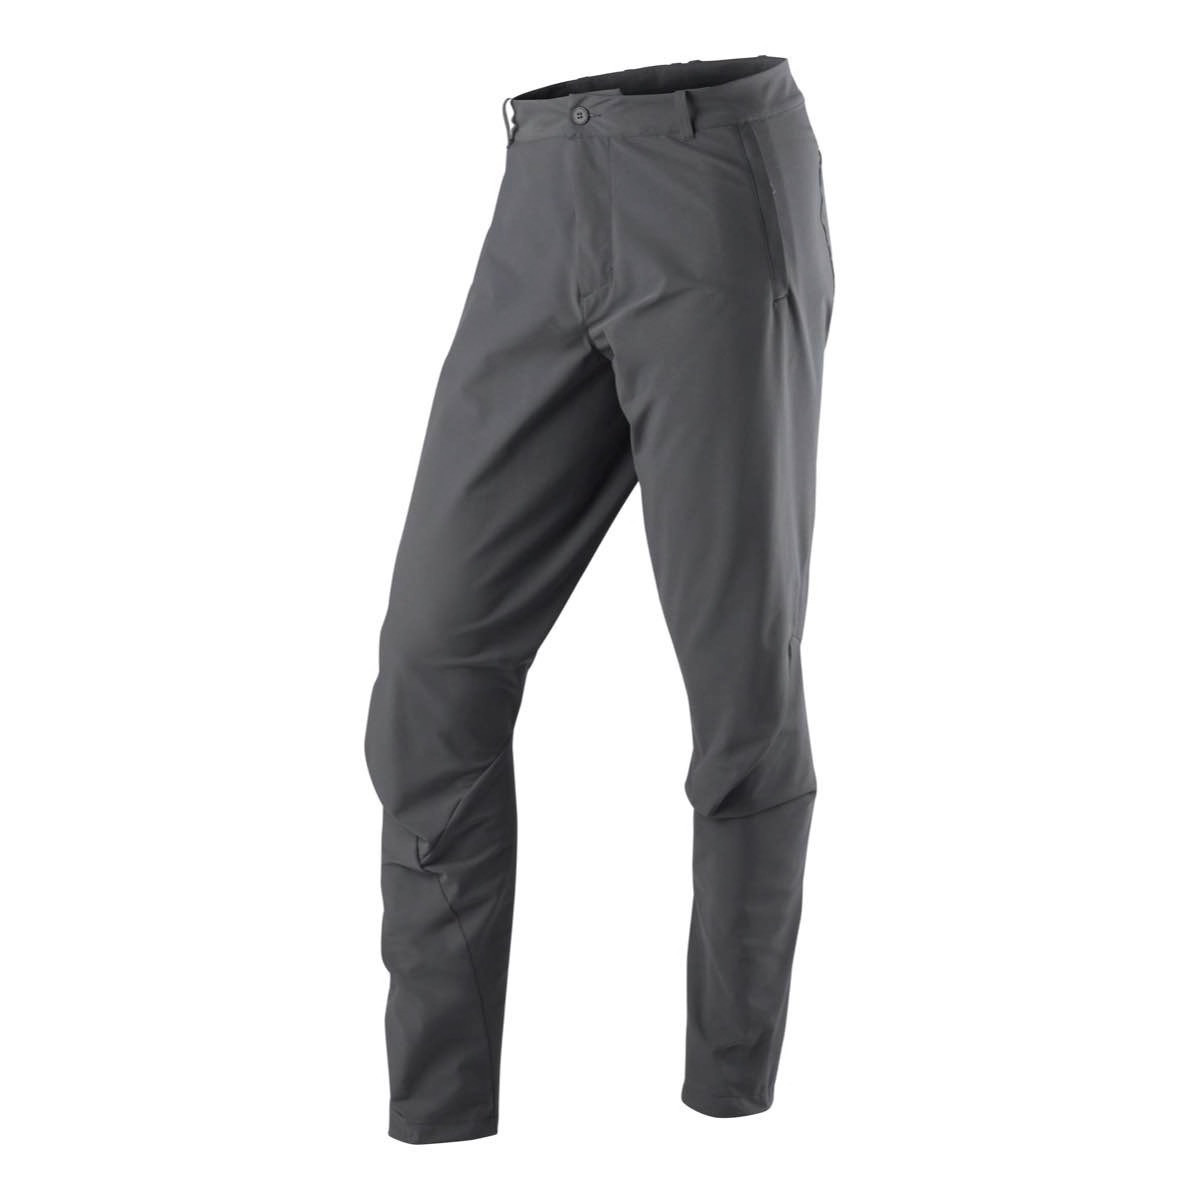 efafd99b Houdini Men's Mtm Thrill Twill Pants Rock Black | Fjellsport.no